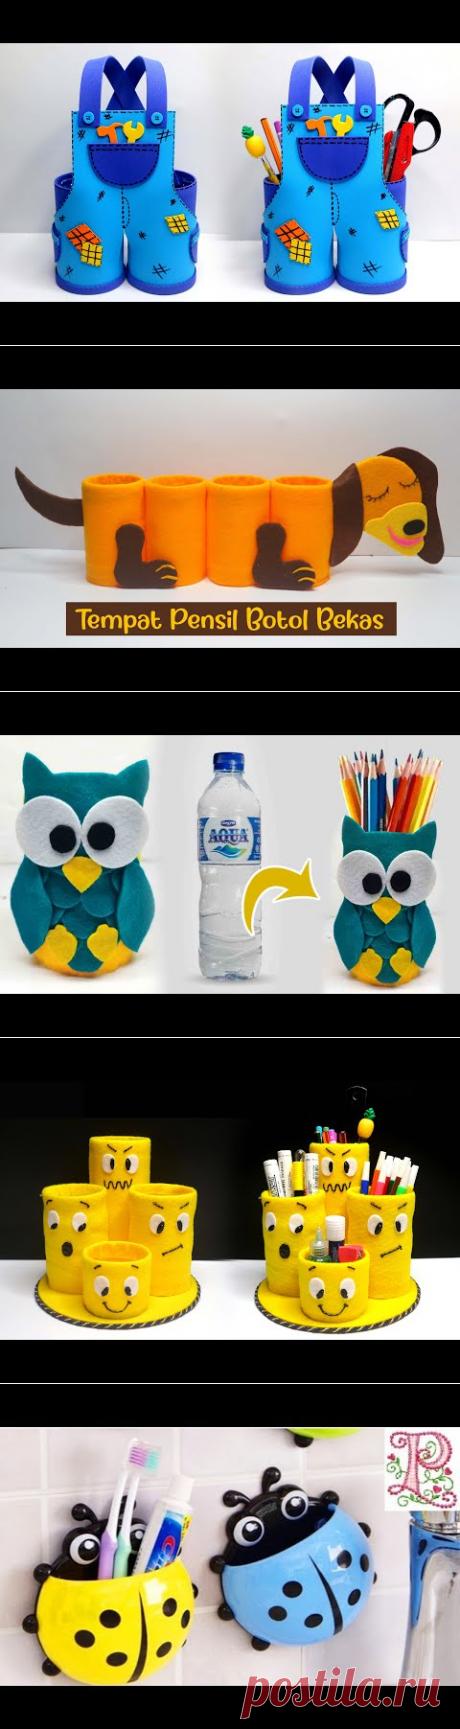 Ide Kreatif Tutorial tempat pensil dari botol plastik bekas aqua 600 ml / Plastick bottle pen holder - YouTube